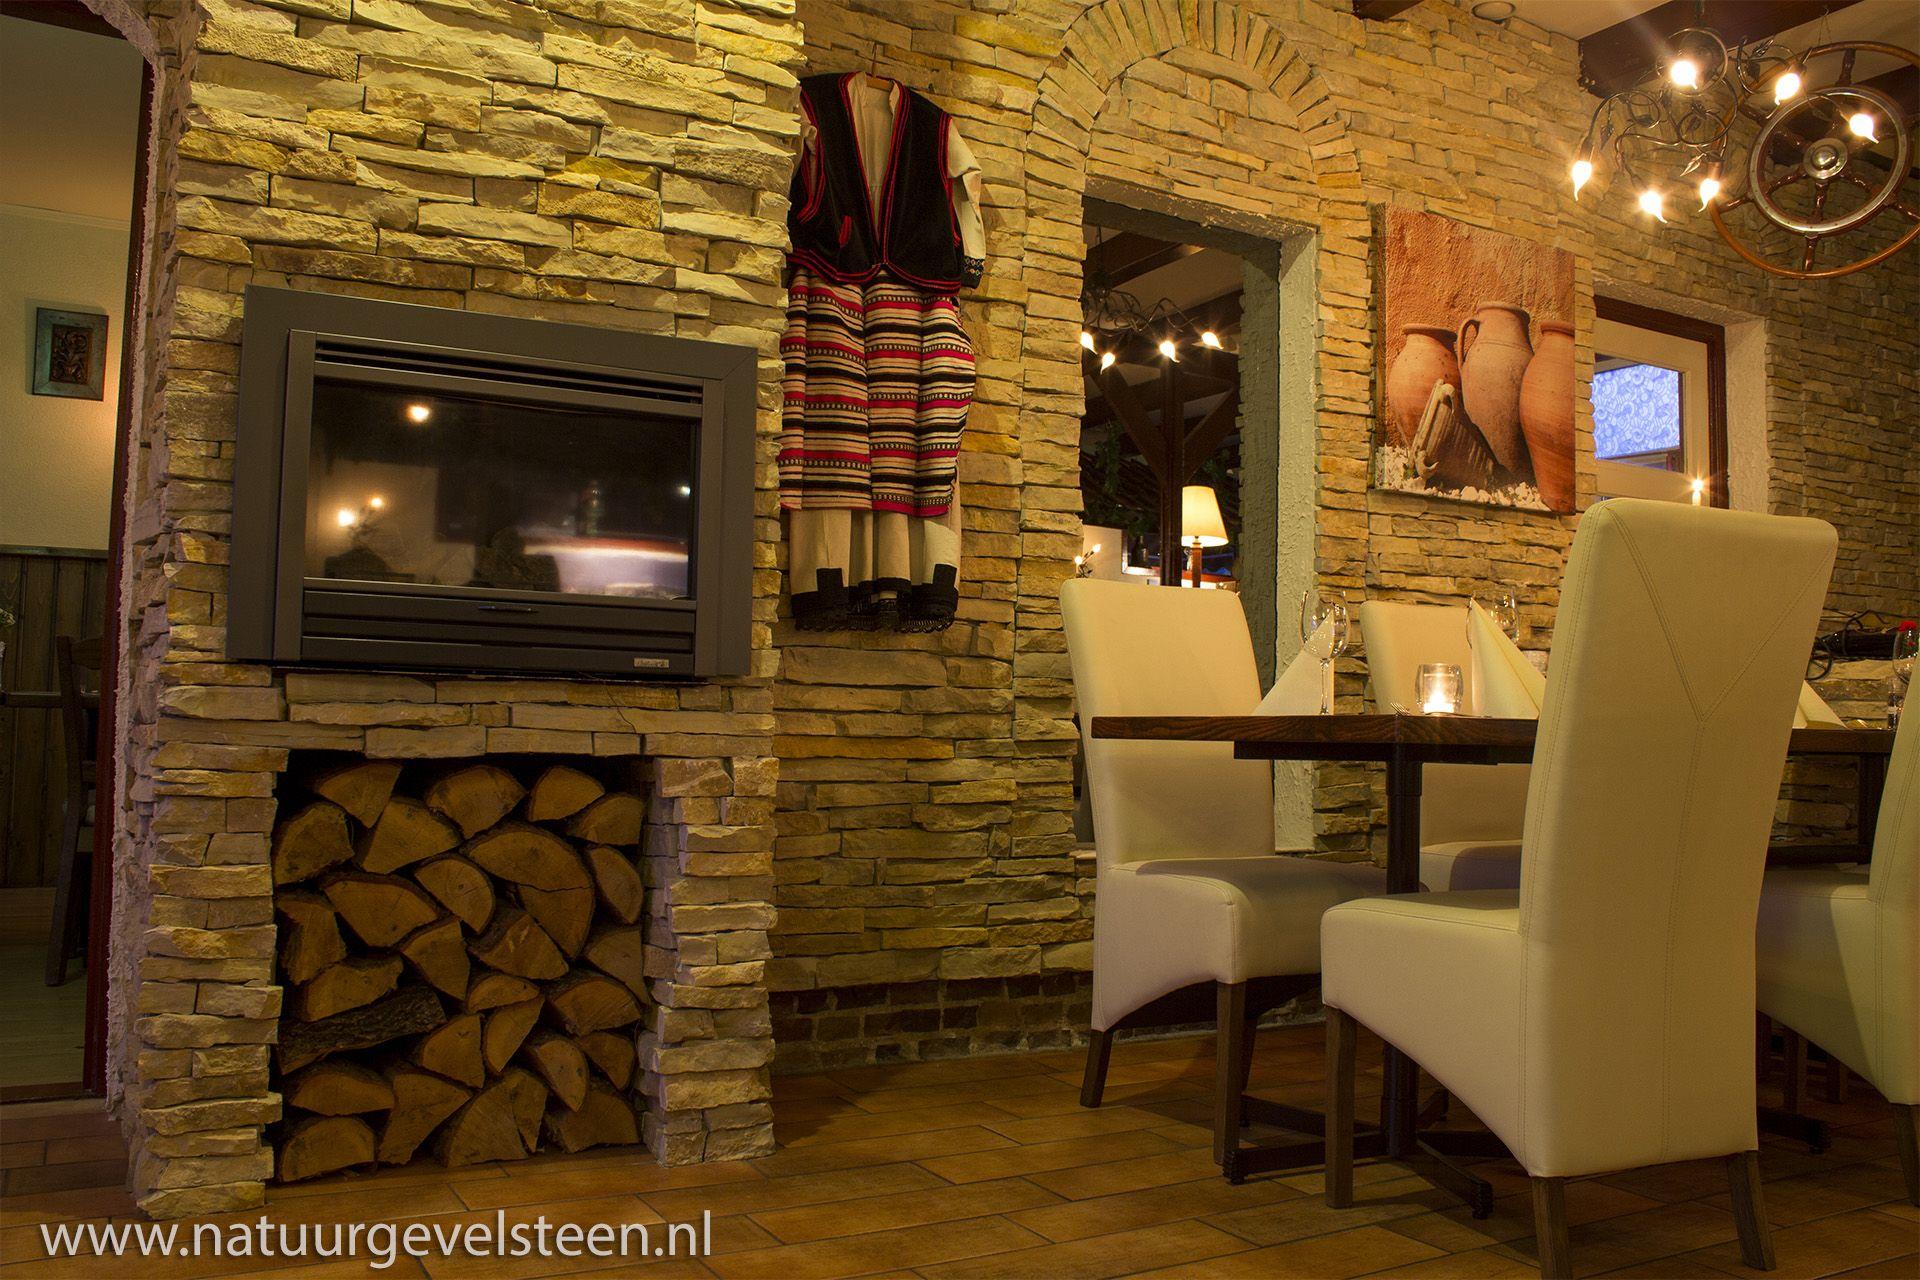 Natuursteen strips   Natuursteen Wandbekleding   Interieur   Balkan Restaurant Ohrid   Natuurgevelsteen